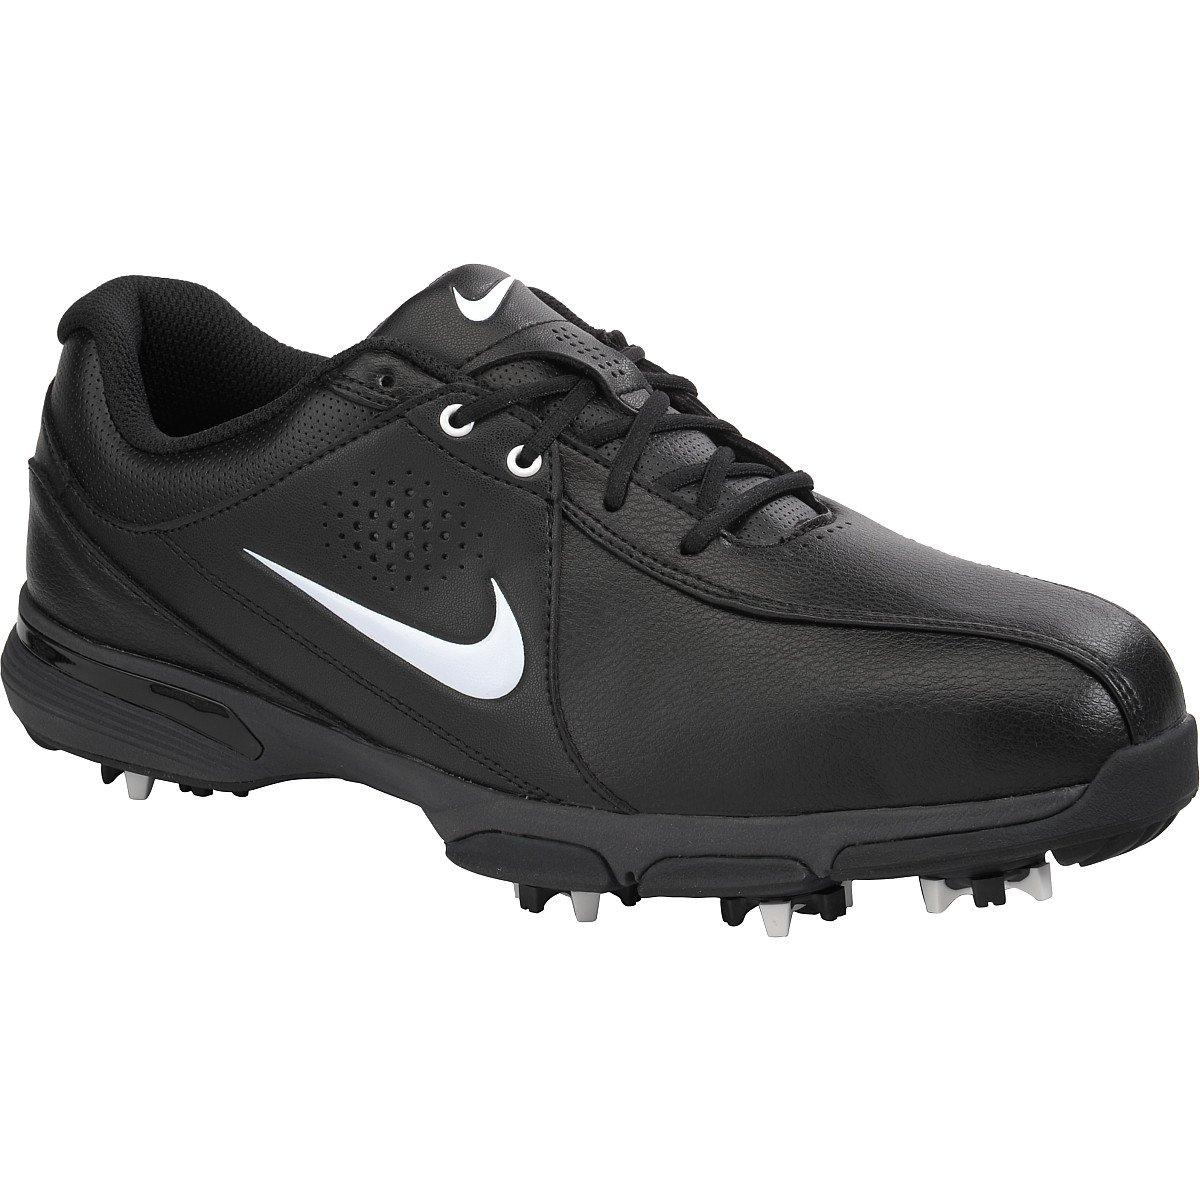 Nike Durasport 3 (W) Mens Golf Shoe (12 2E) by Nike (Image #1)